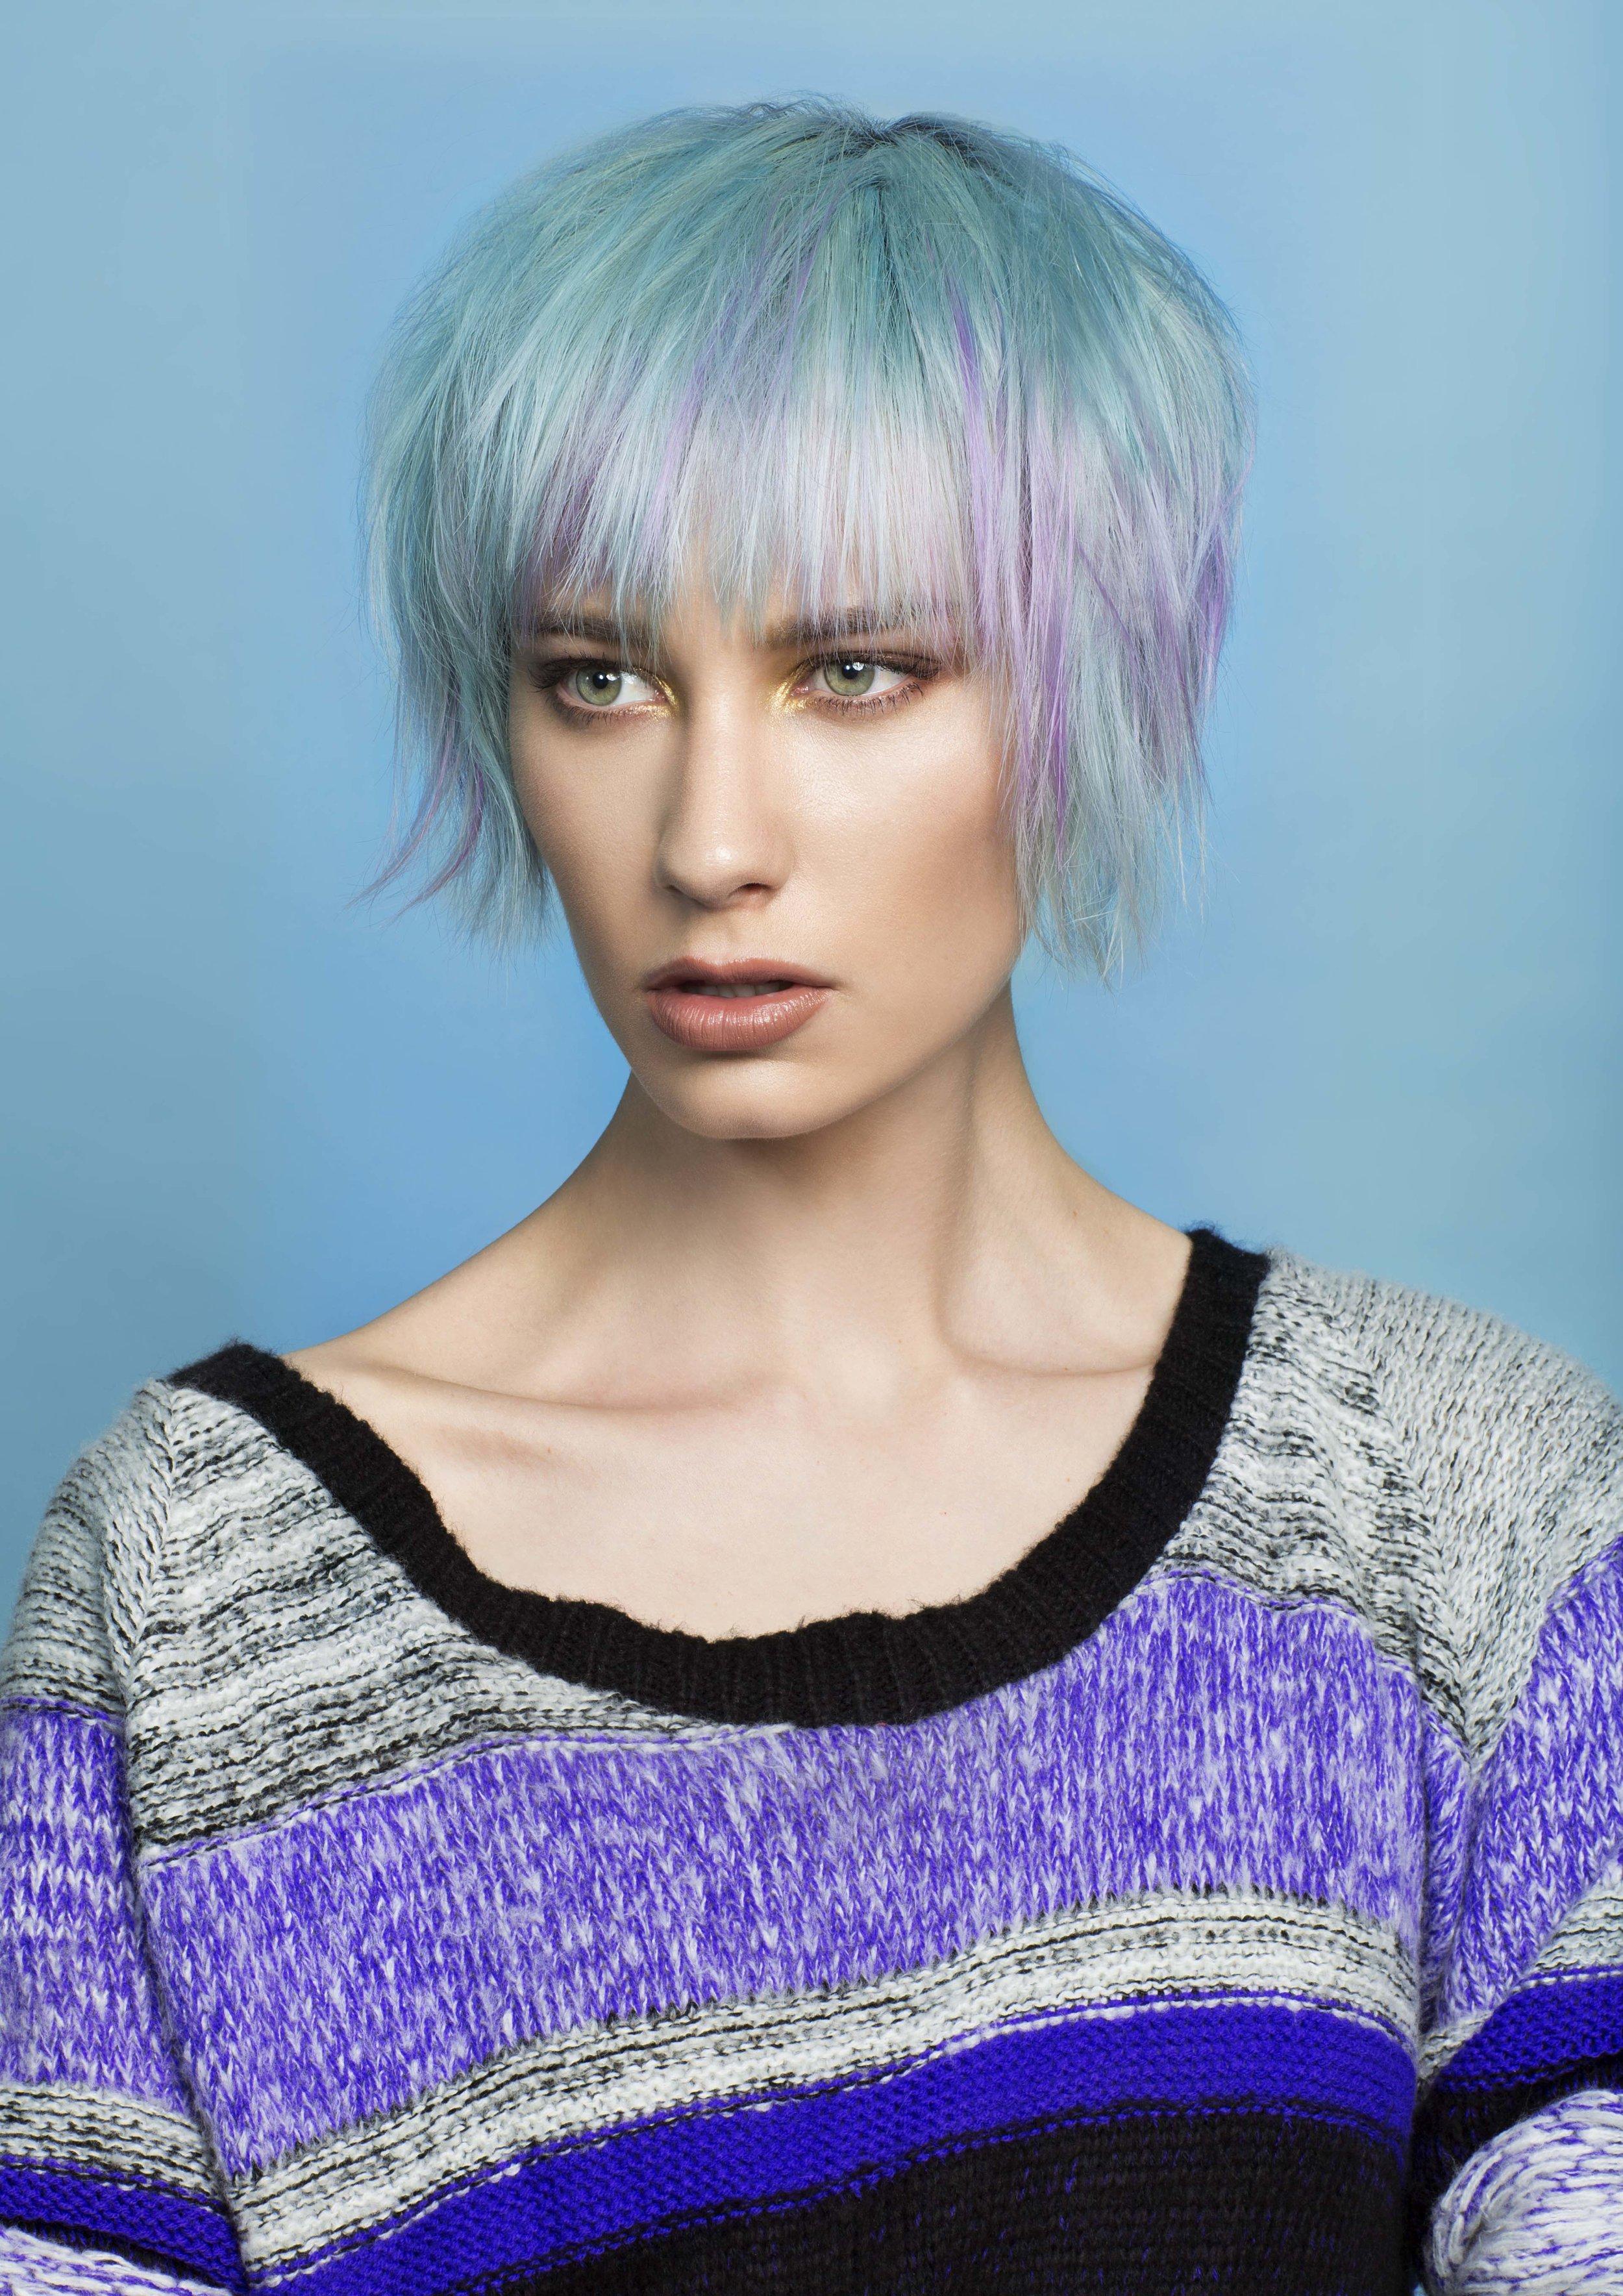 Queensland Hairdresser Andre Faiva Image_06.jpg